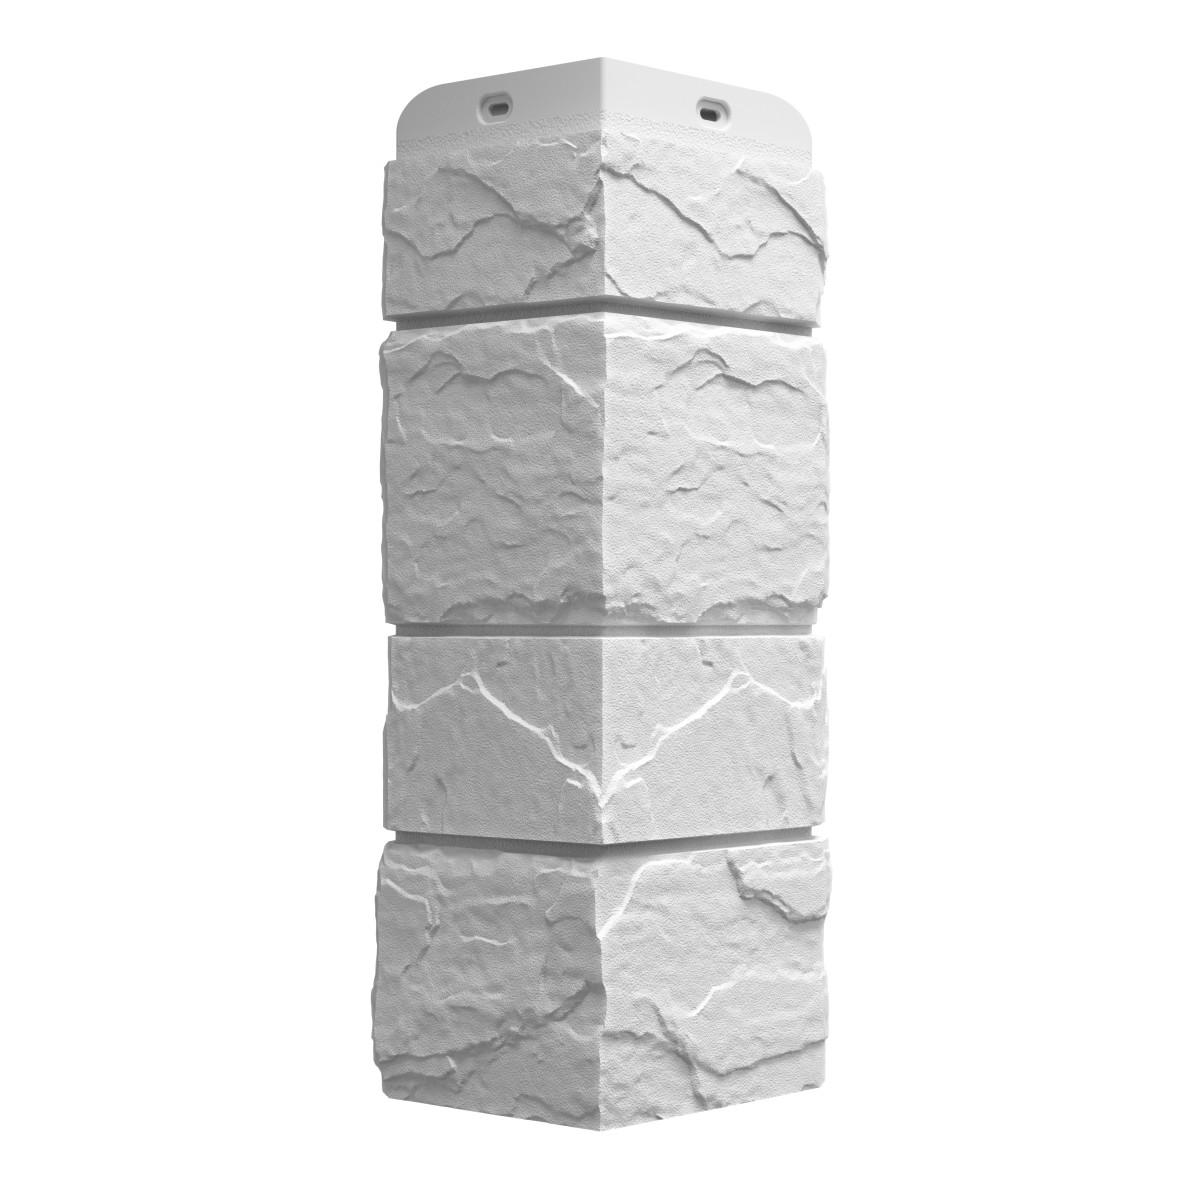 Угол наружный Dacha Камень крупный цвет белый